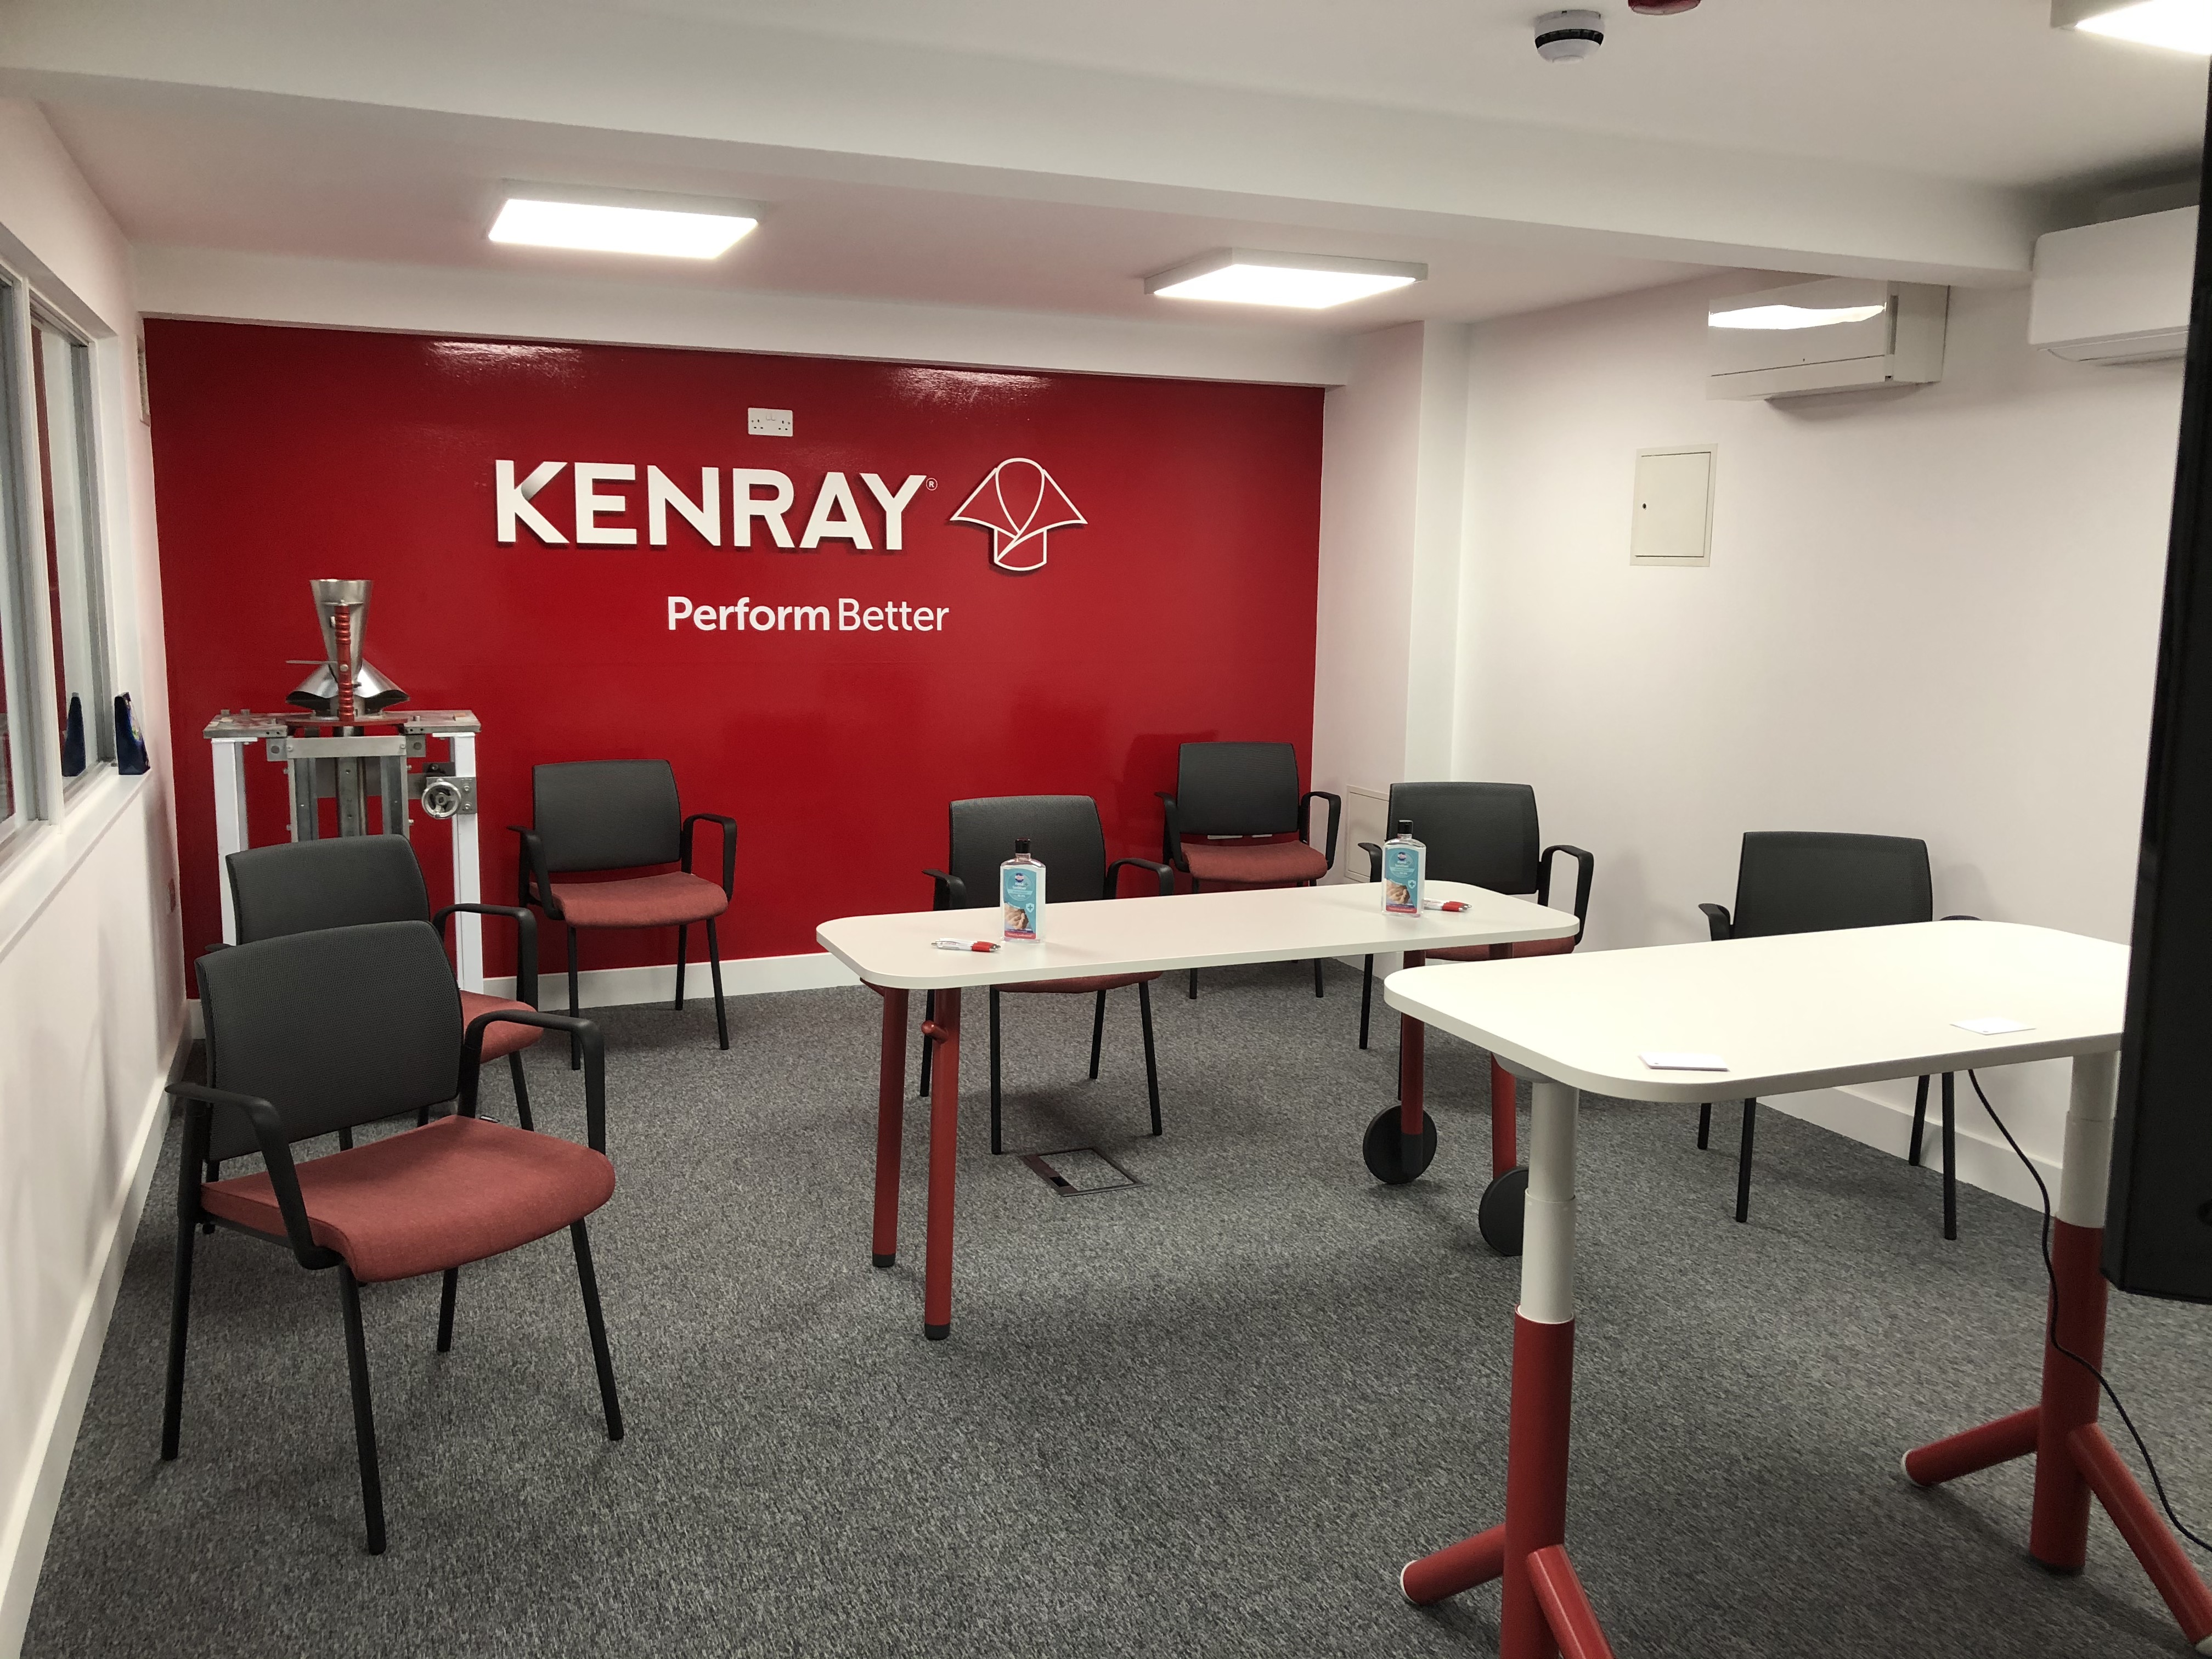 Kenray Training Facility - Kenray Forming Ltd